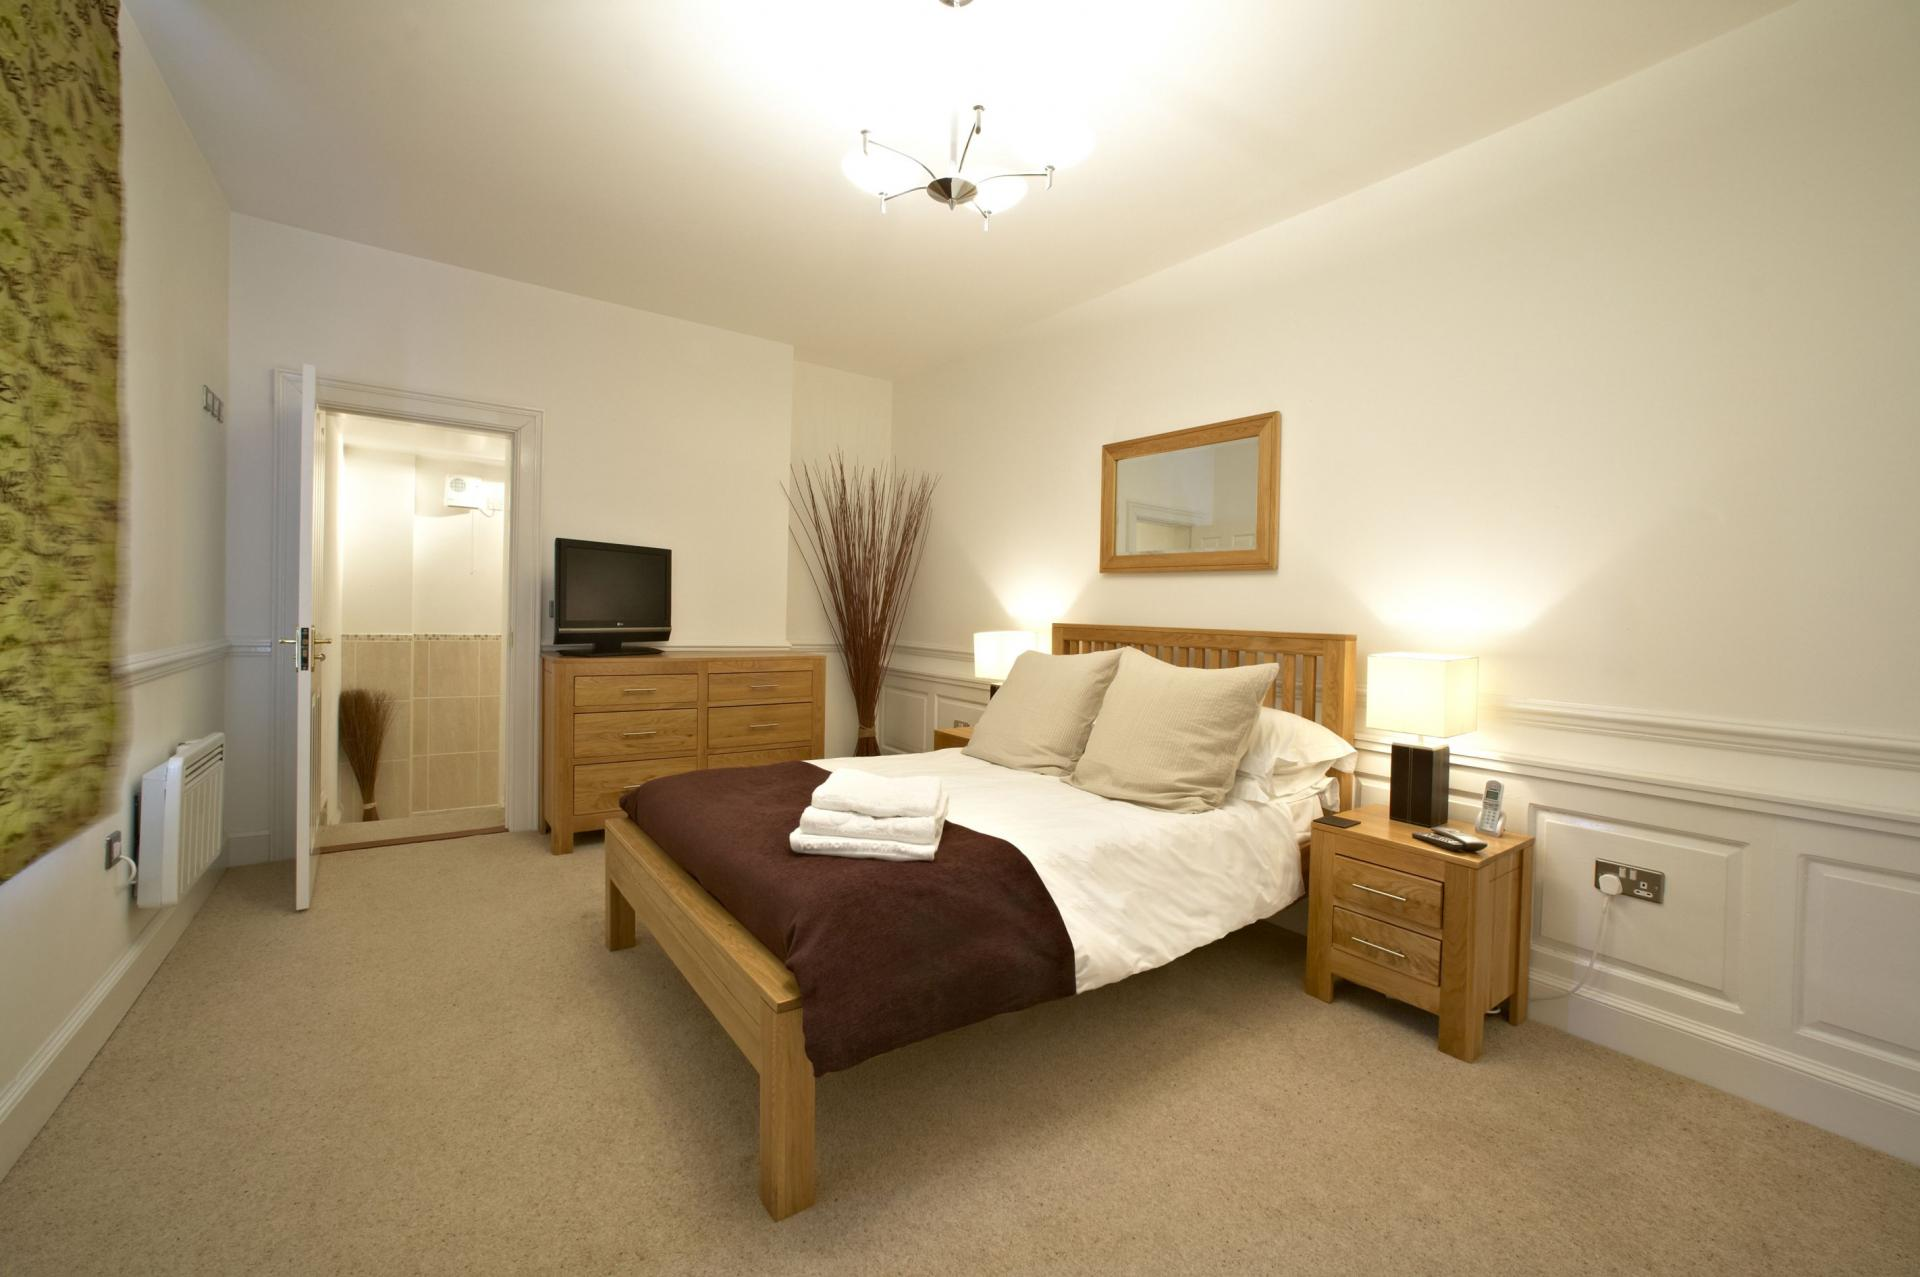 Bedroom at Villetts House Apartment, Centre, Swindon